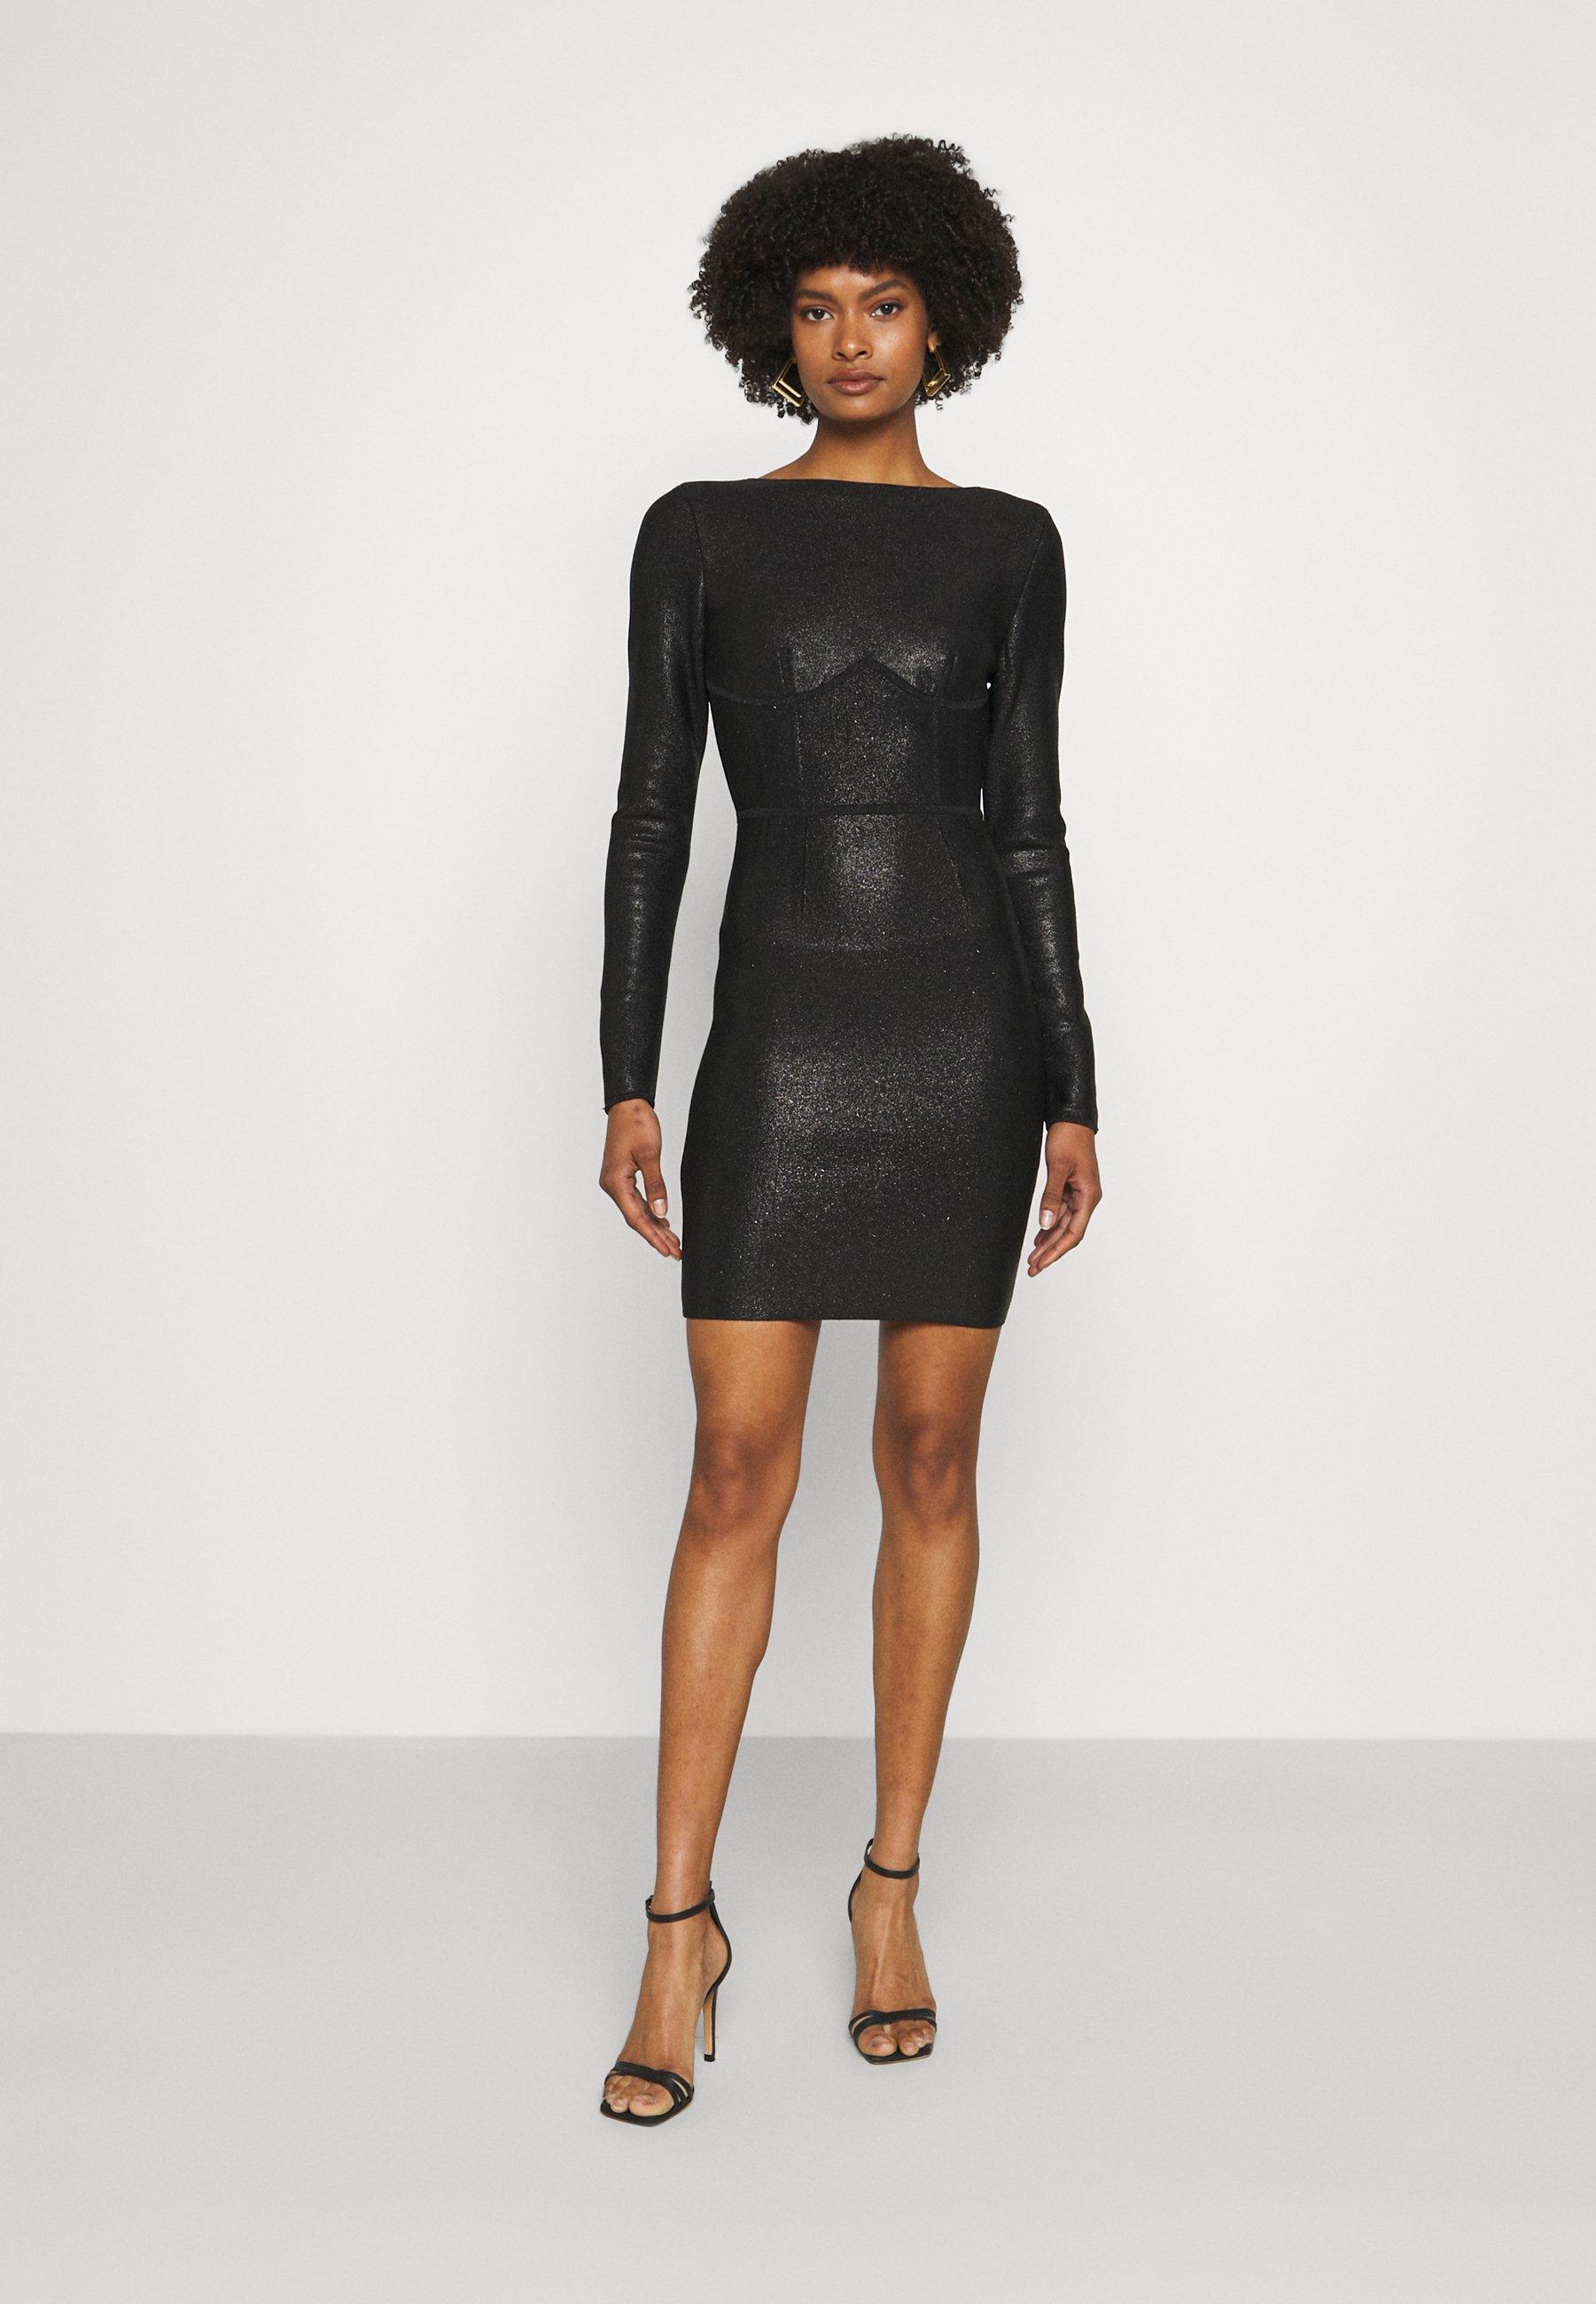 Women HERVE LEGER X JULIA RESTOIN ROITFELD DISCO OPEN BACK MINI DRESS - Cocktail dress / Party dress